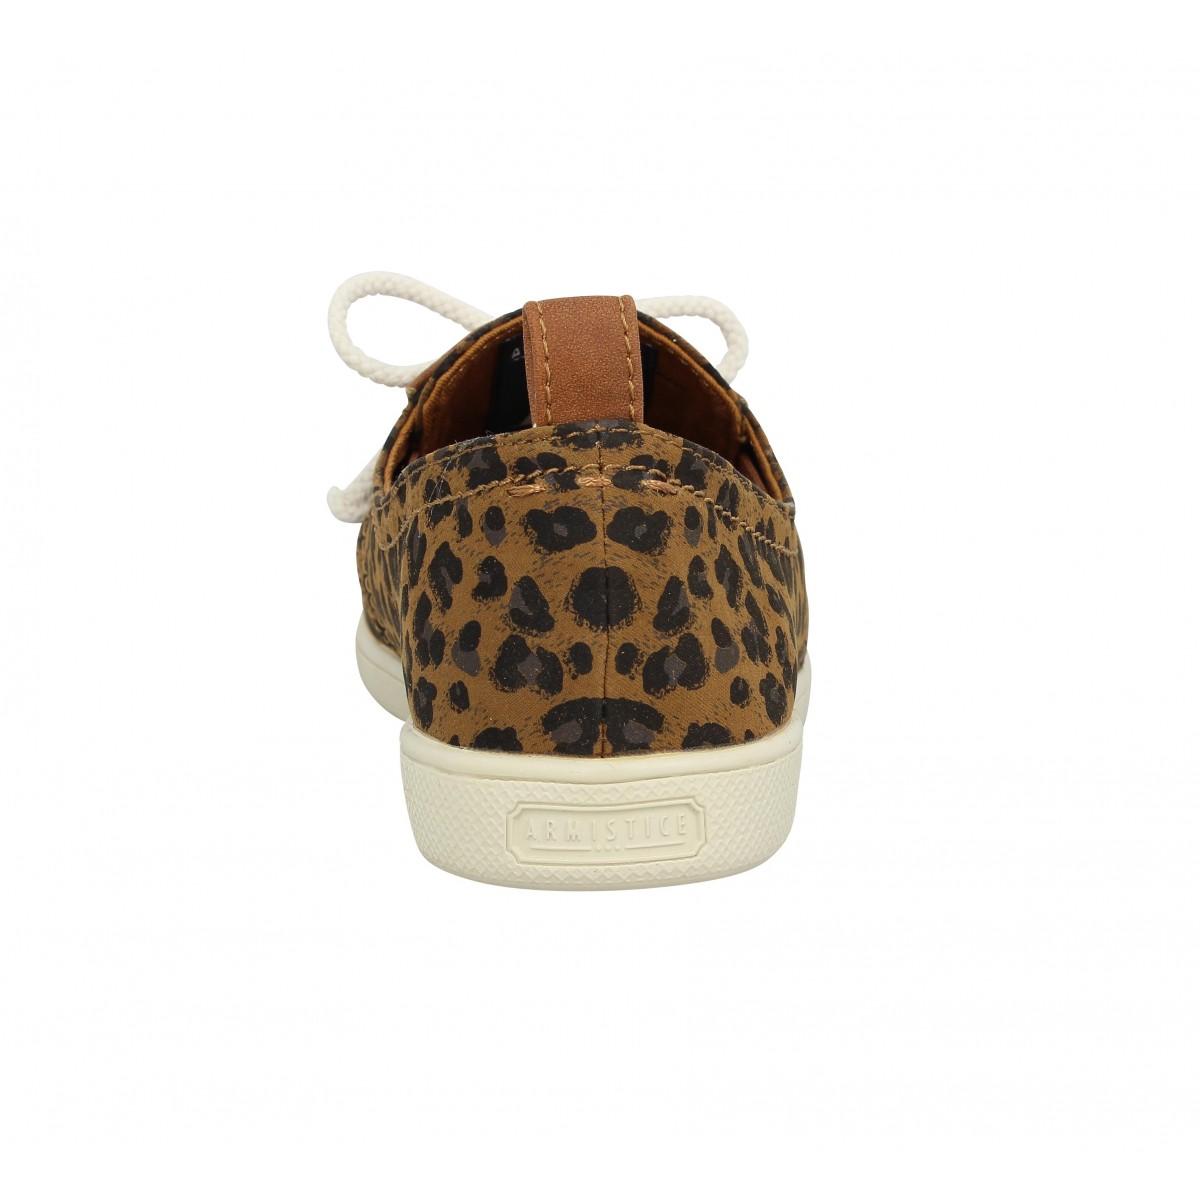 armistice stone one toile leopard femme camel femme fanny chaussures. Black Bedroom Furniture Sets. Home Design Ideas